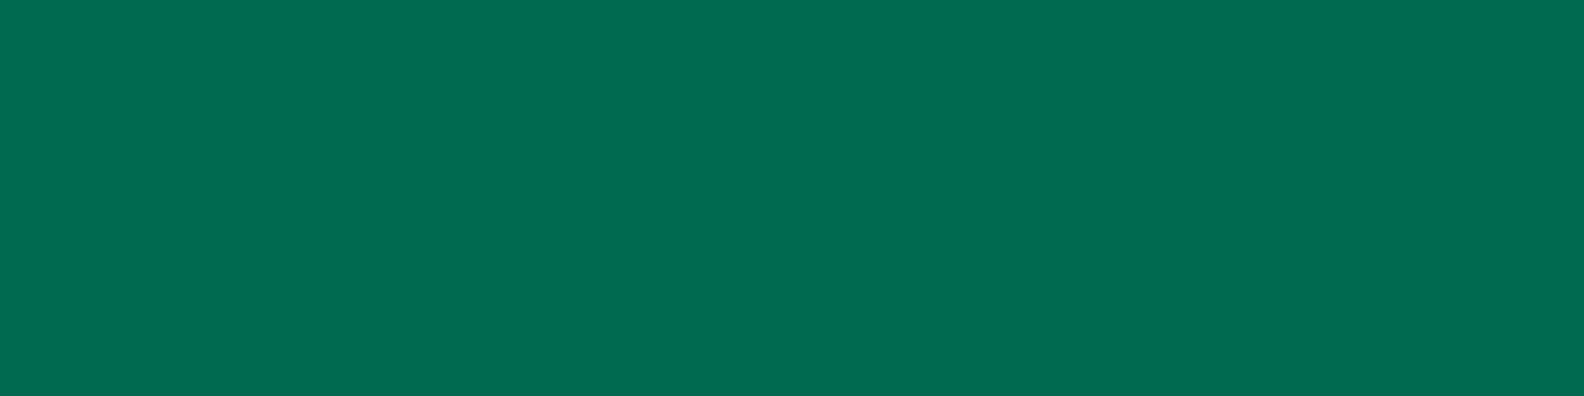 1584x396 Bottle Green Solid Color Background